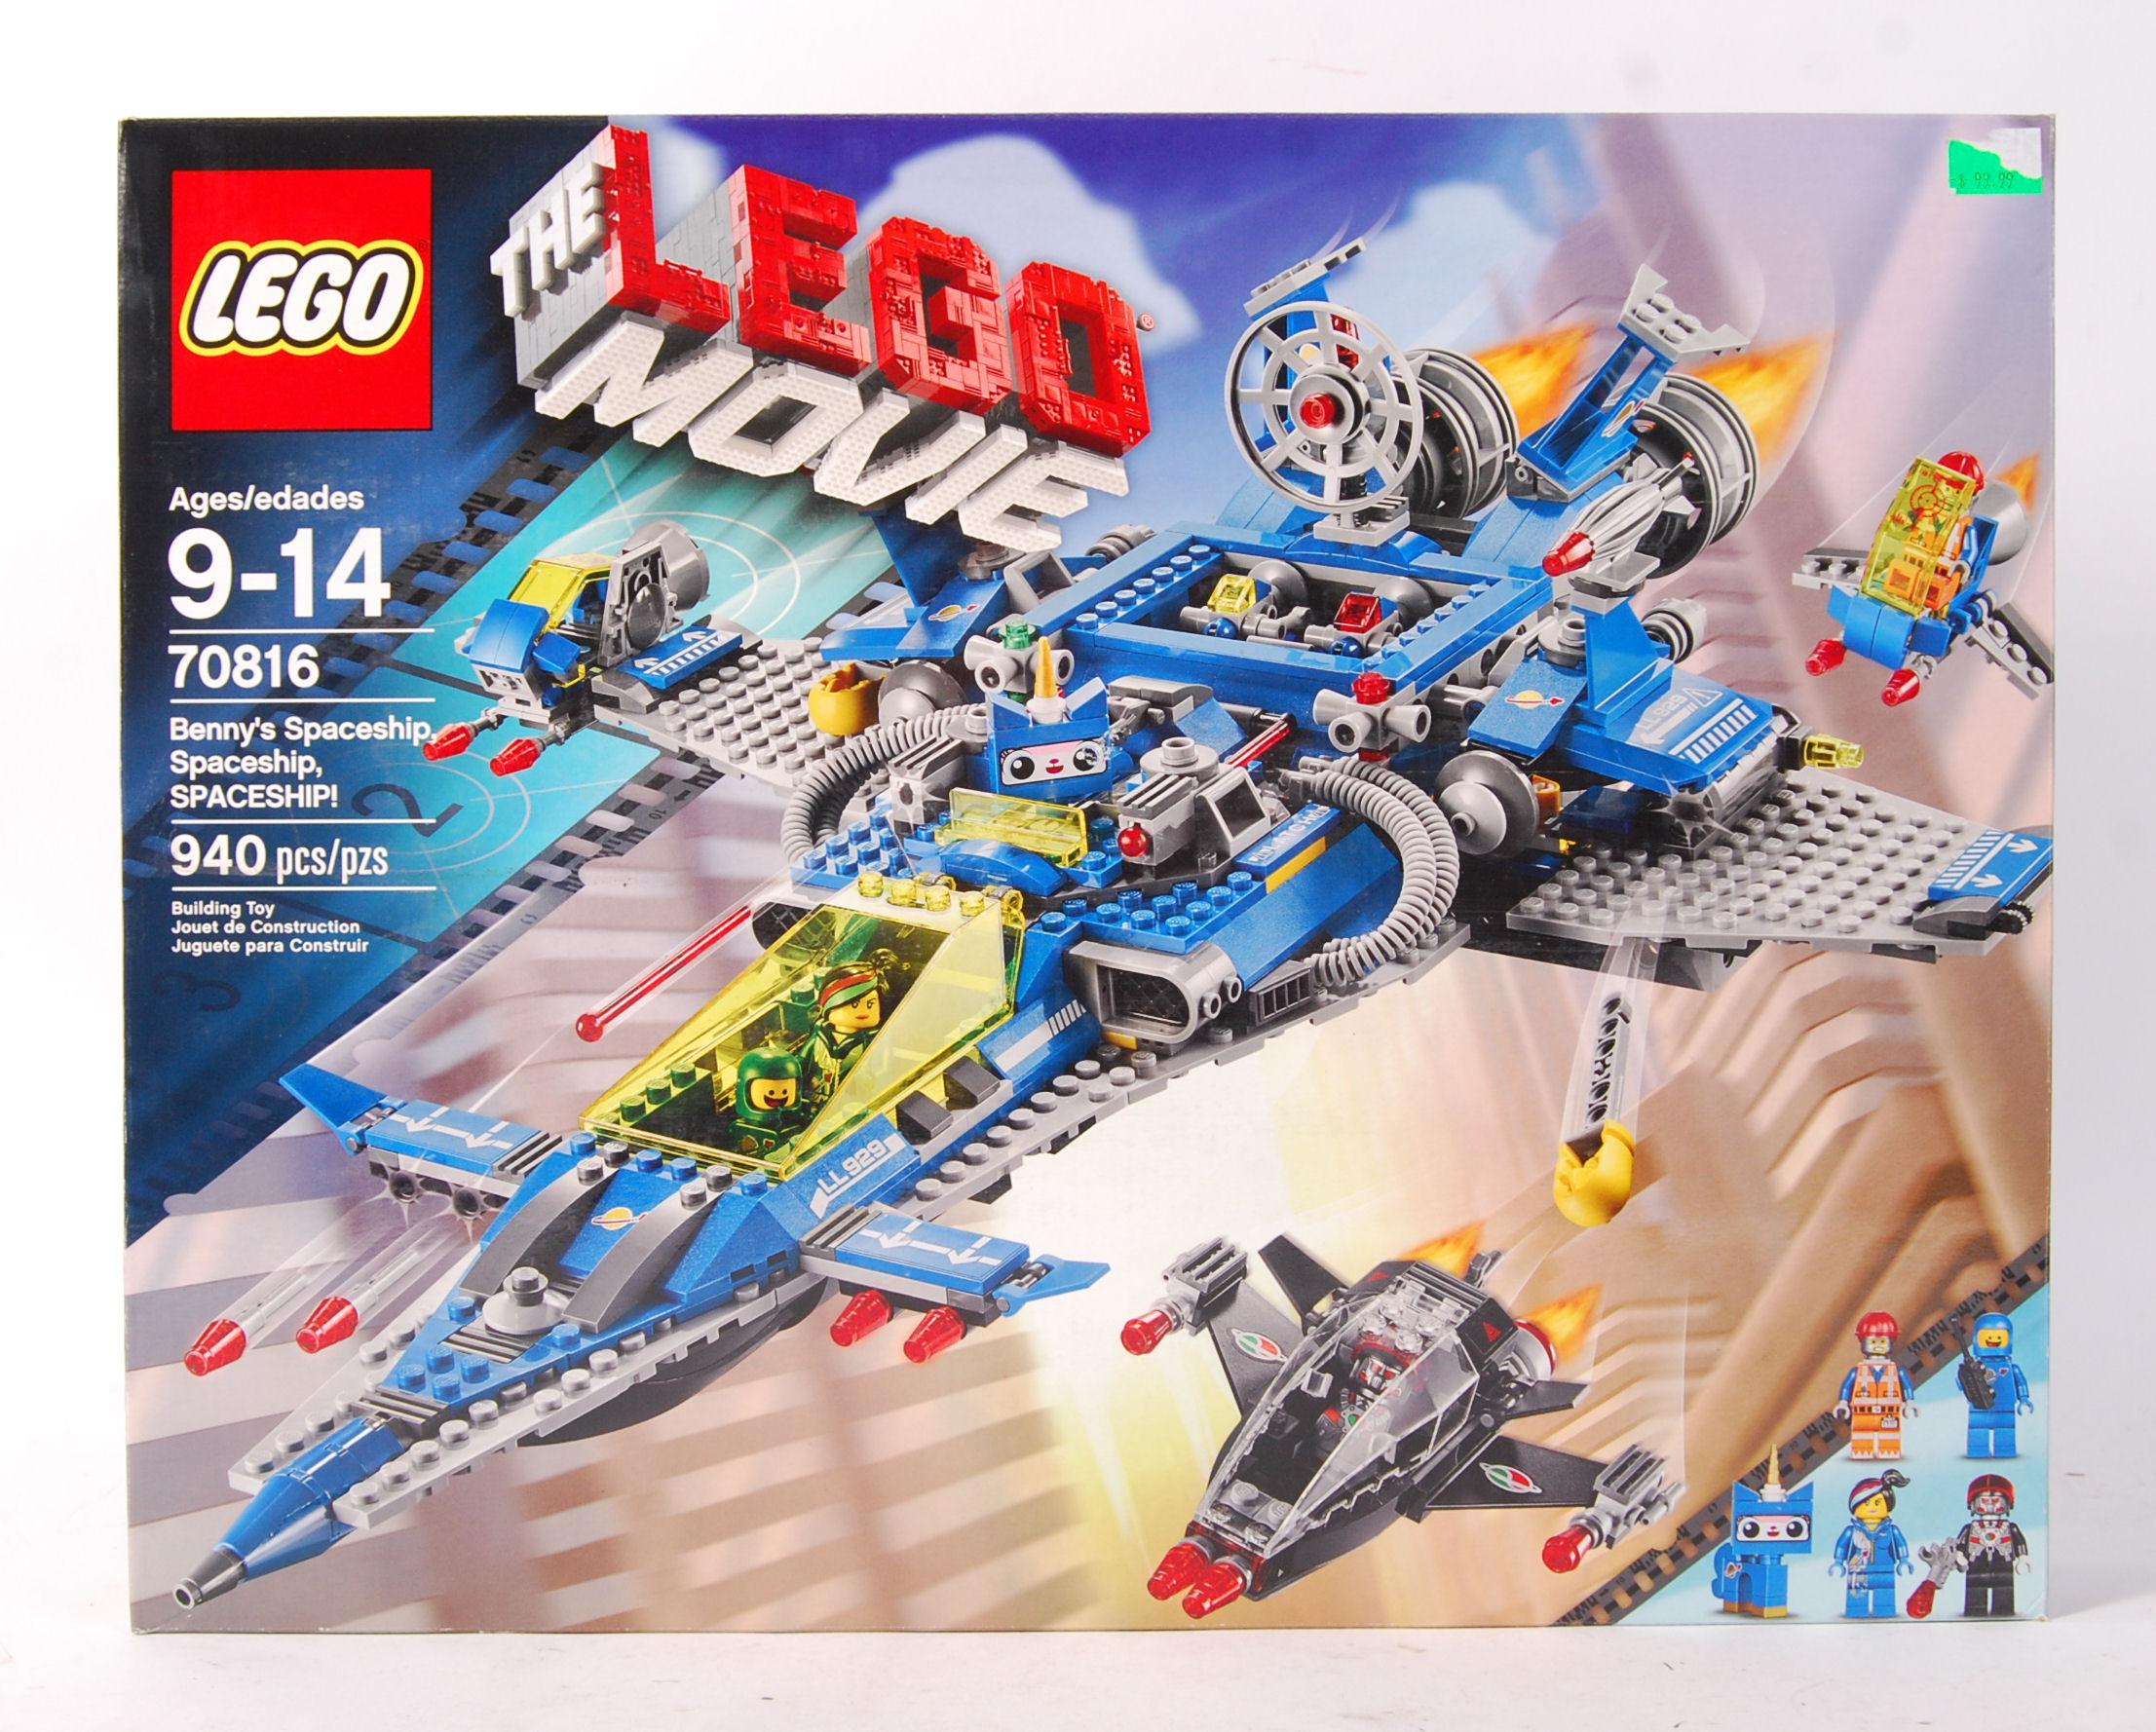 Lot 8 - LEGO THE LEGO MOVIE 70816 ' BENNY'S SPACESHIP , SP